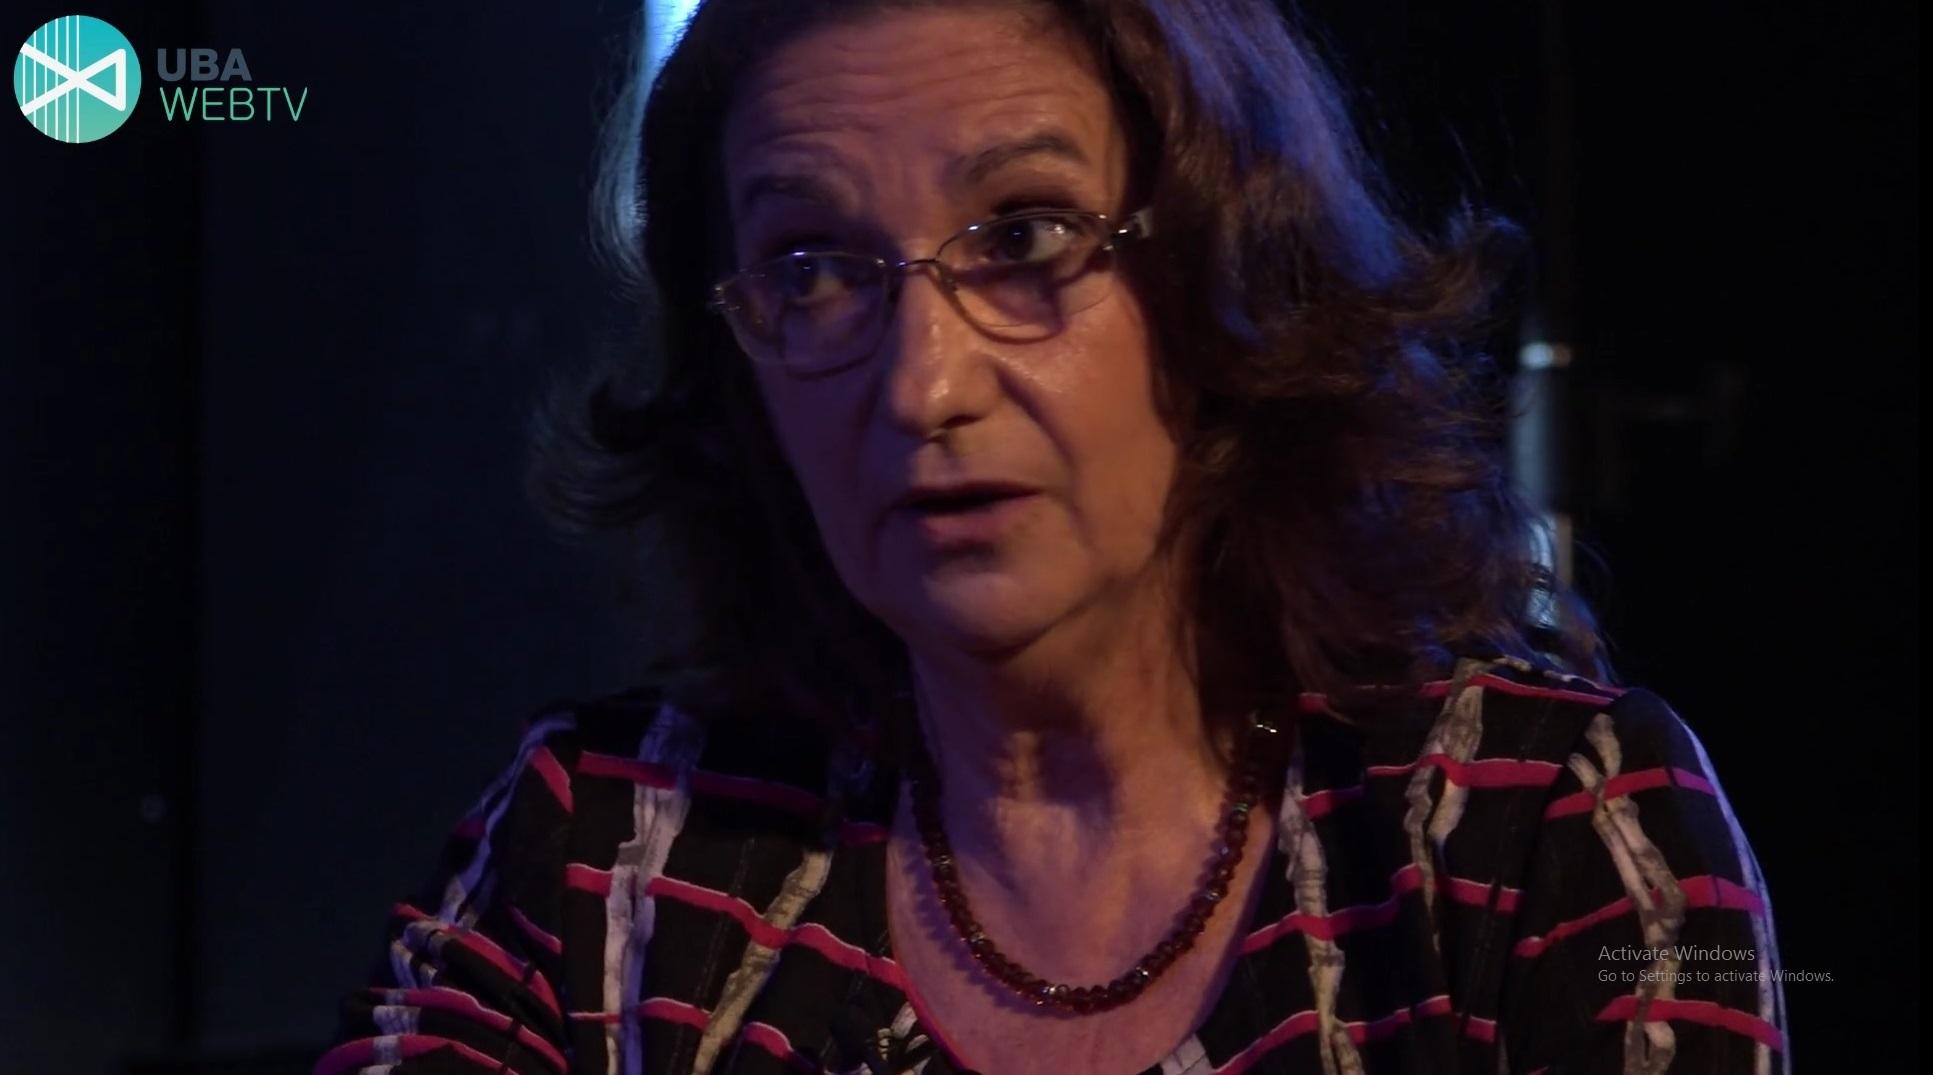 MAESTRAS, Capítulo 6: Cristina Moreira